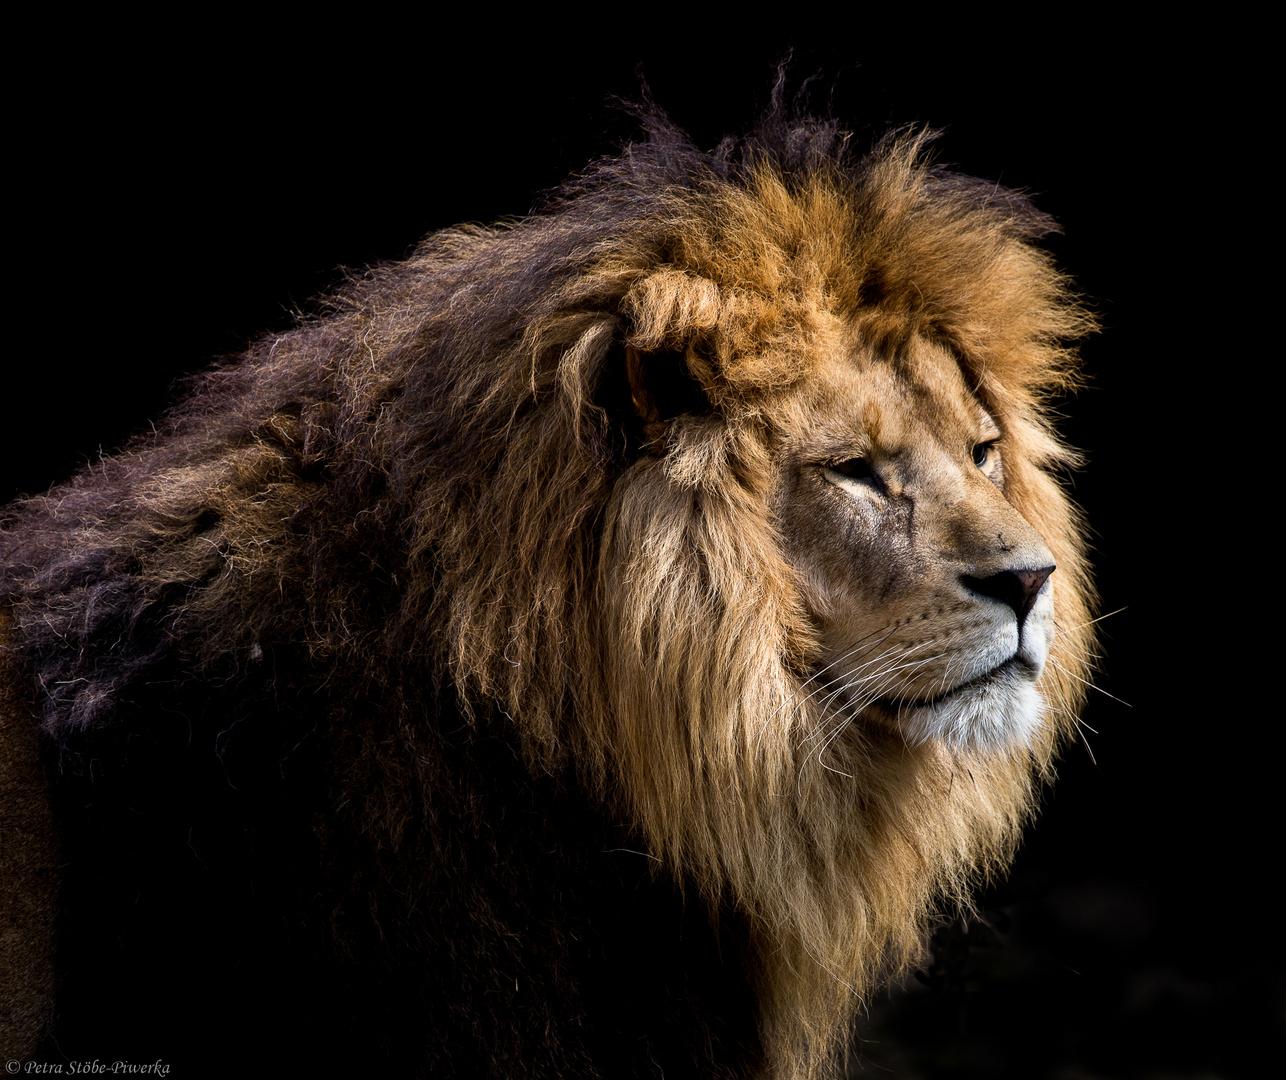 König Max